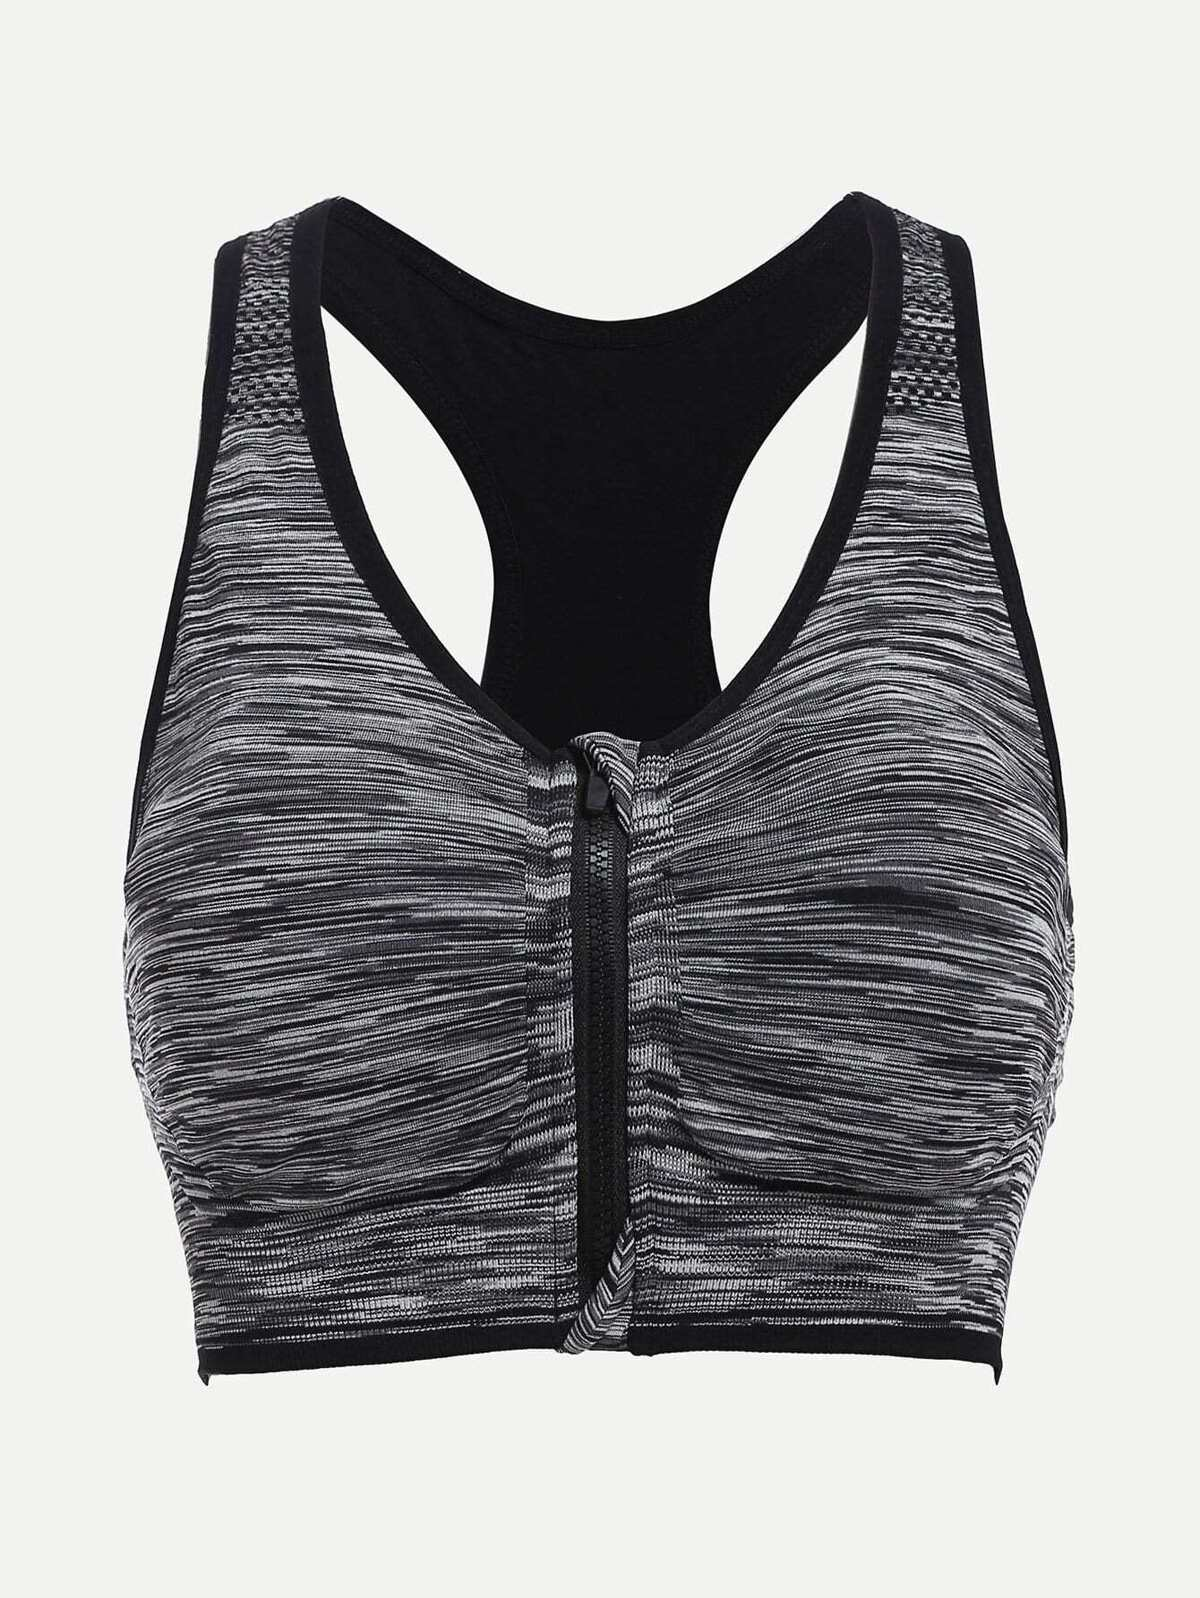 T型背 運動胸罩